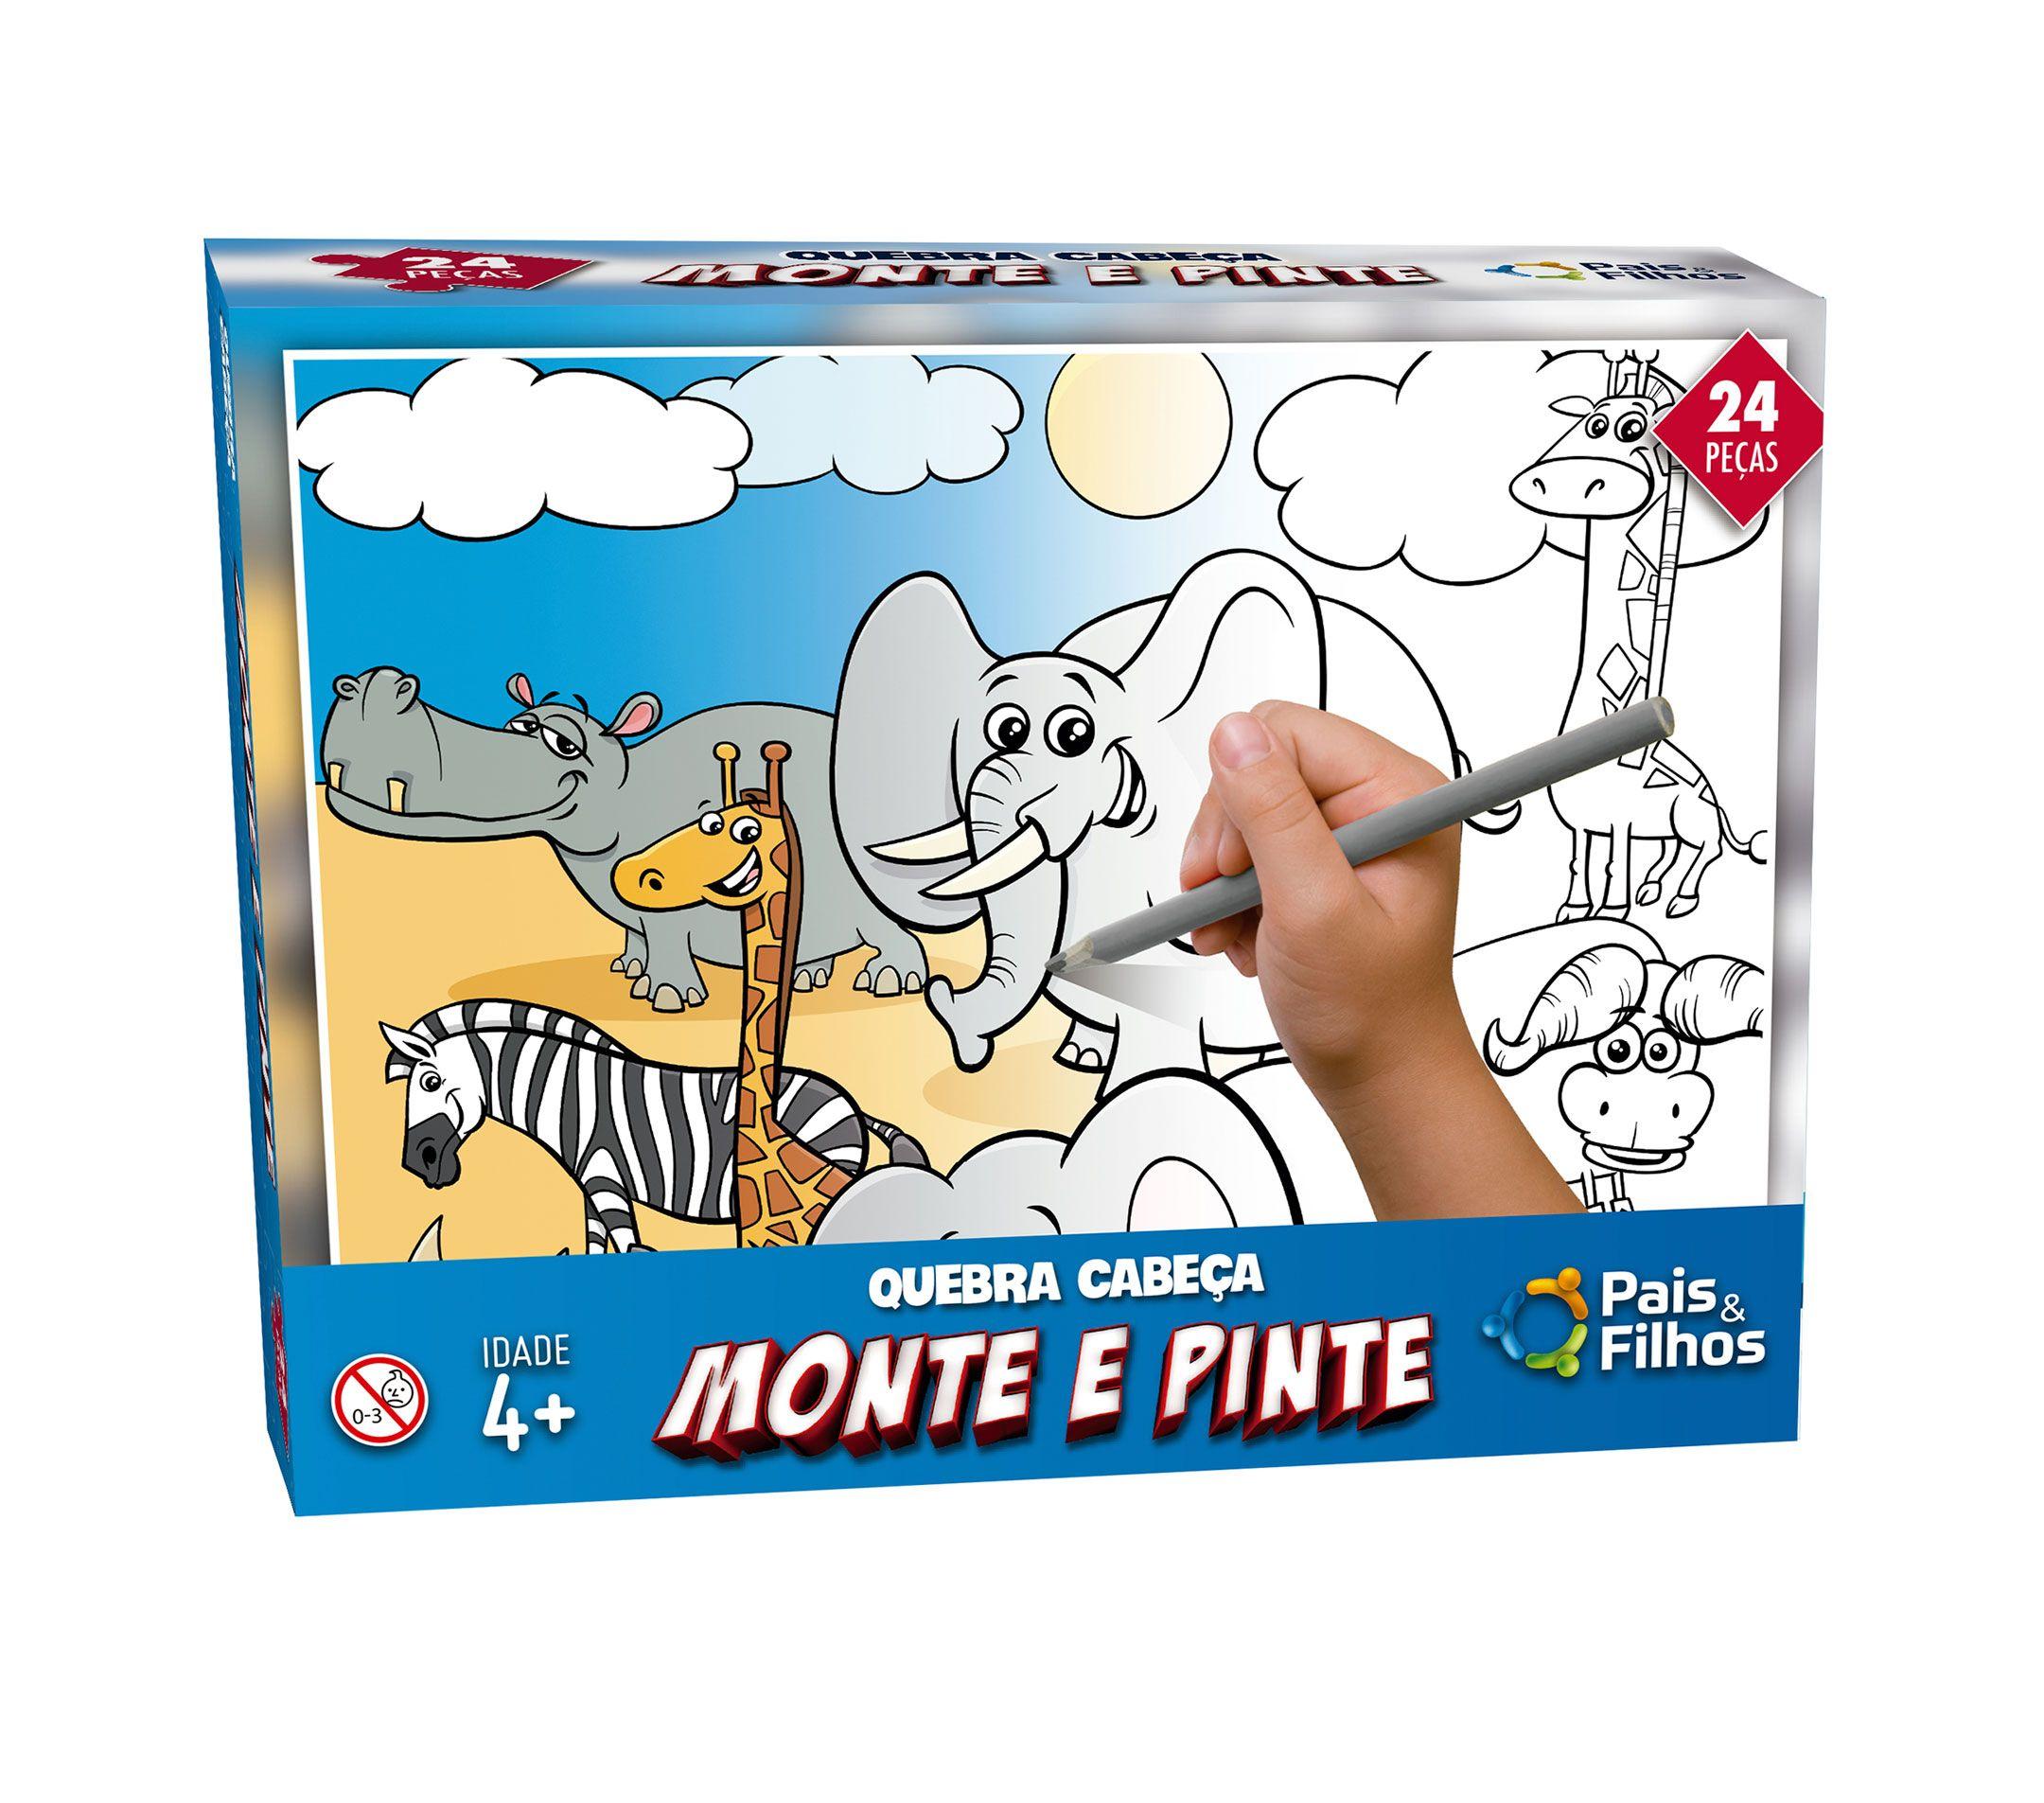 Monte e pinte Safari - 24 peças -0996